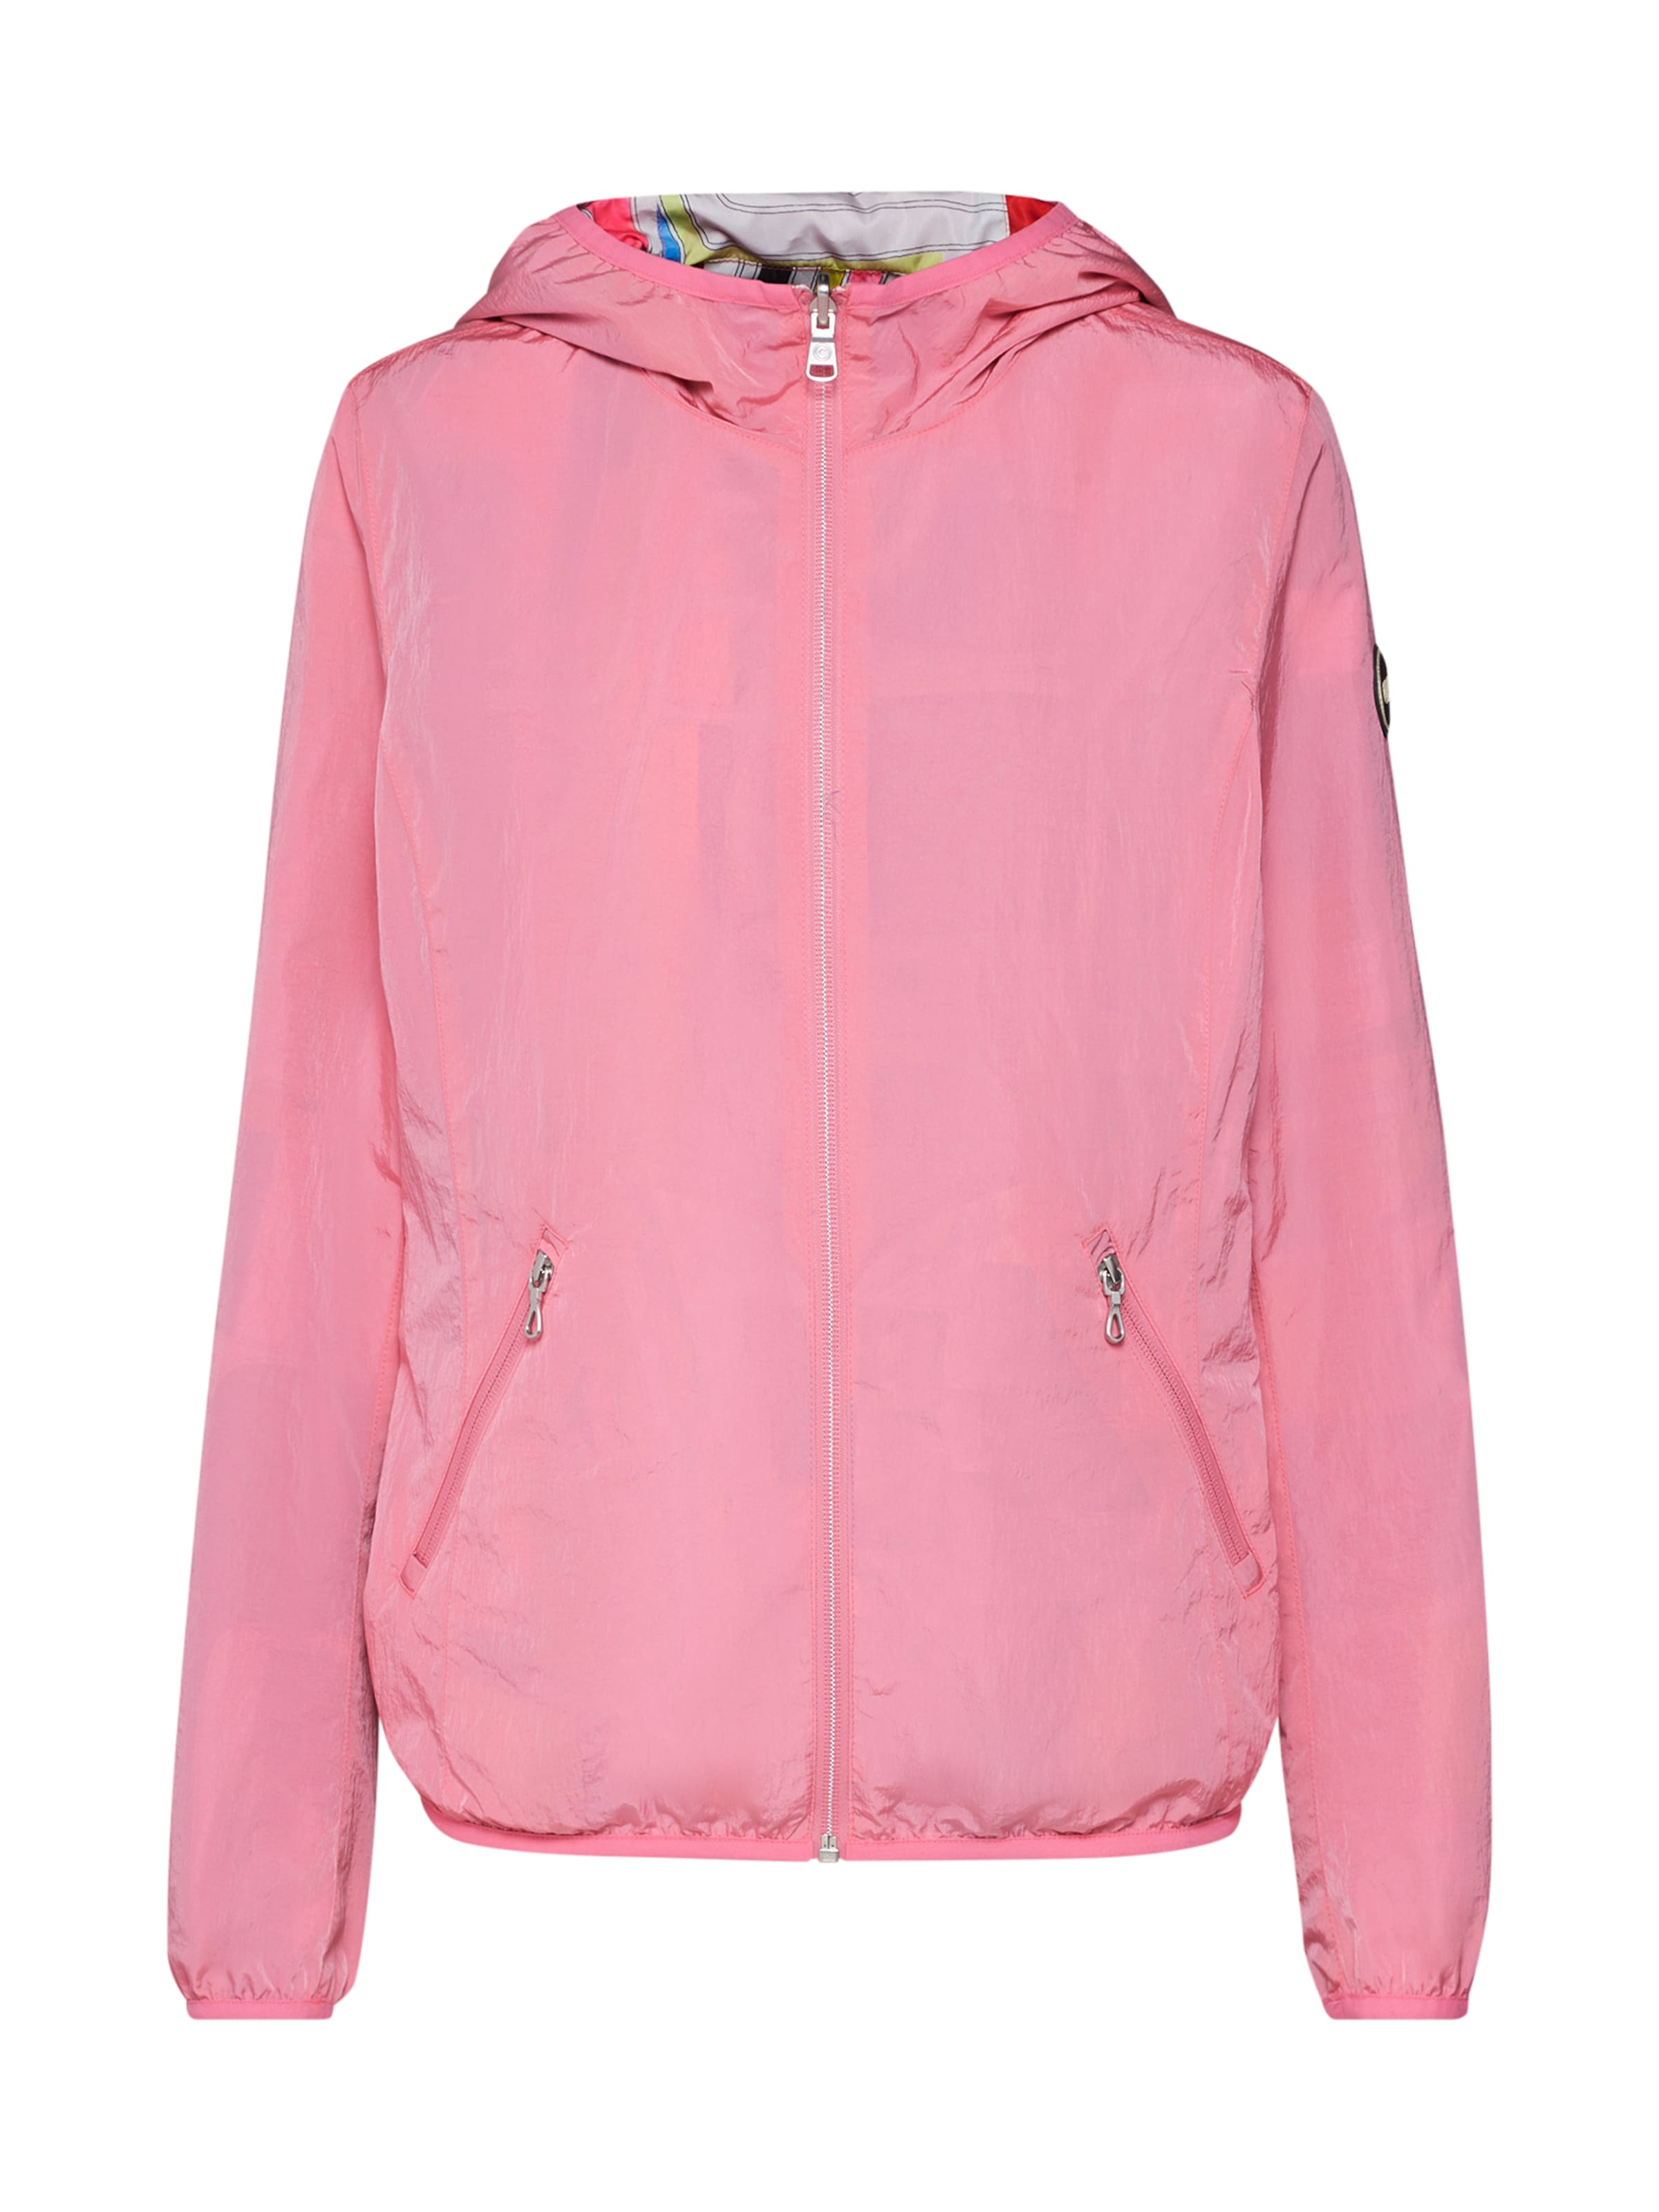 'giacche Reversibili Colmar Jacke Donna' In MischfarbenRosa vmN8n0w